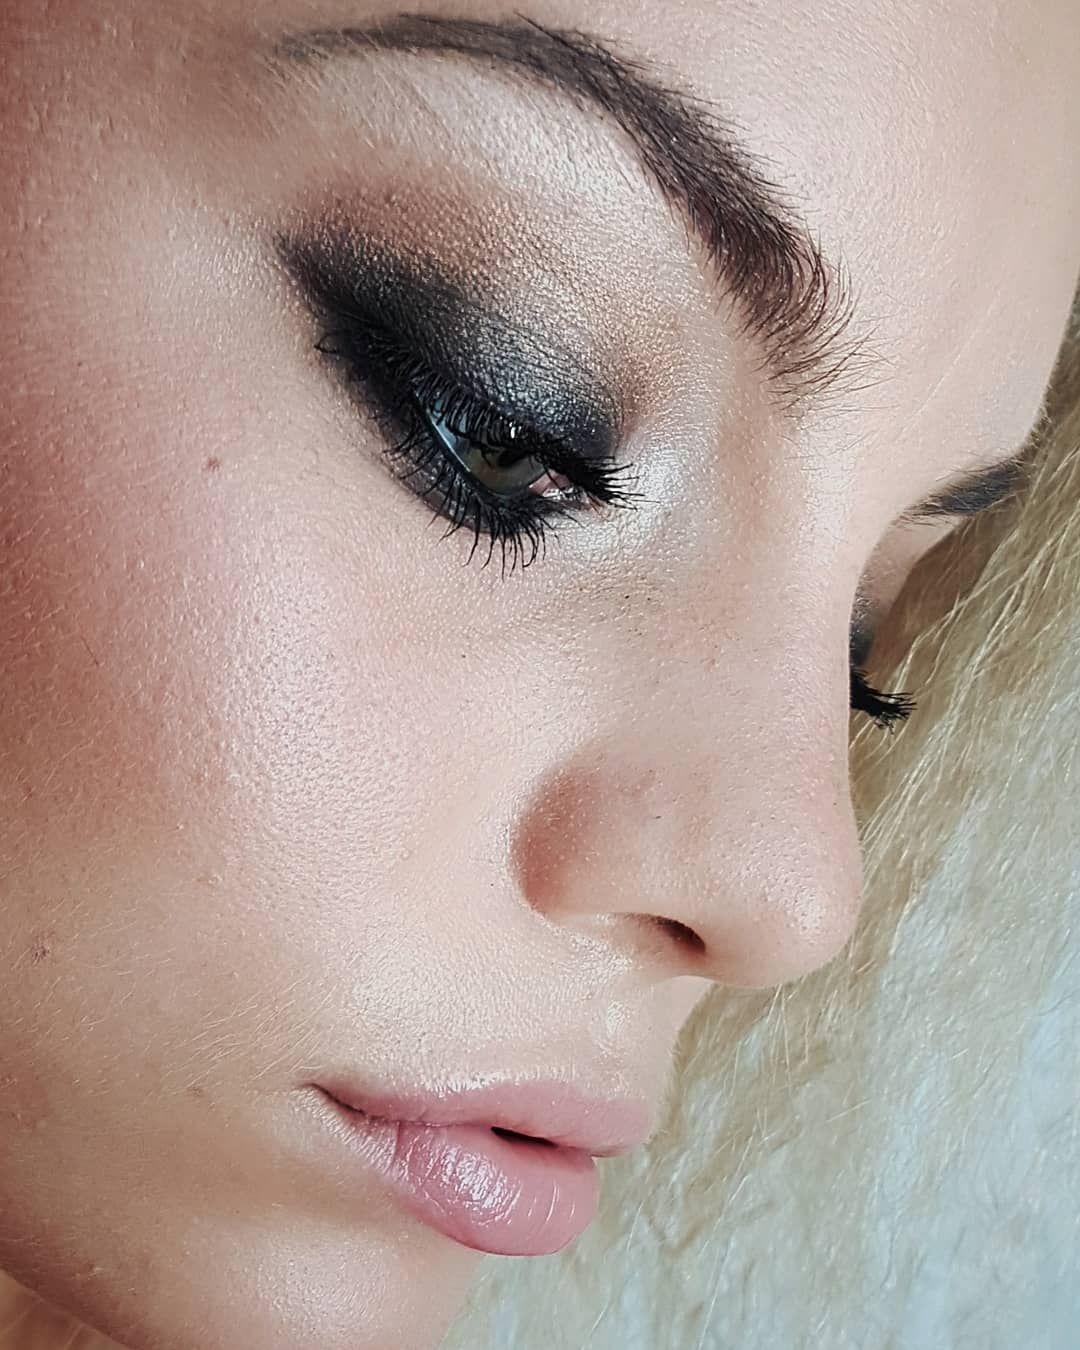 Dark and mysterious     #makeup#makeuplook#mua#dark#mysterious#smokey#smokeyeye#intensive#black#gloss#brows#blonde#hair#crepe#fluffyhair#closeup#makeupmaikki